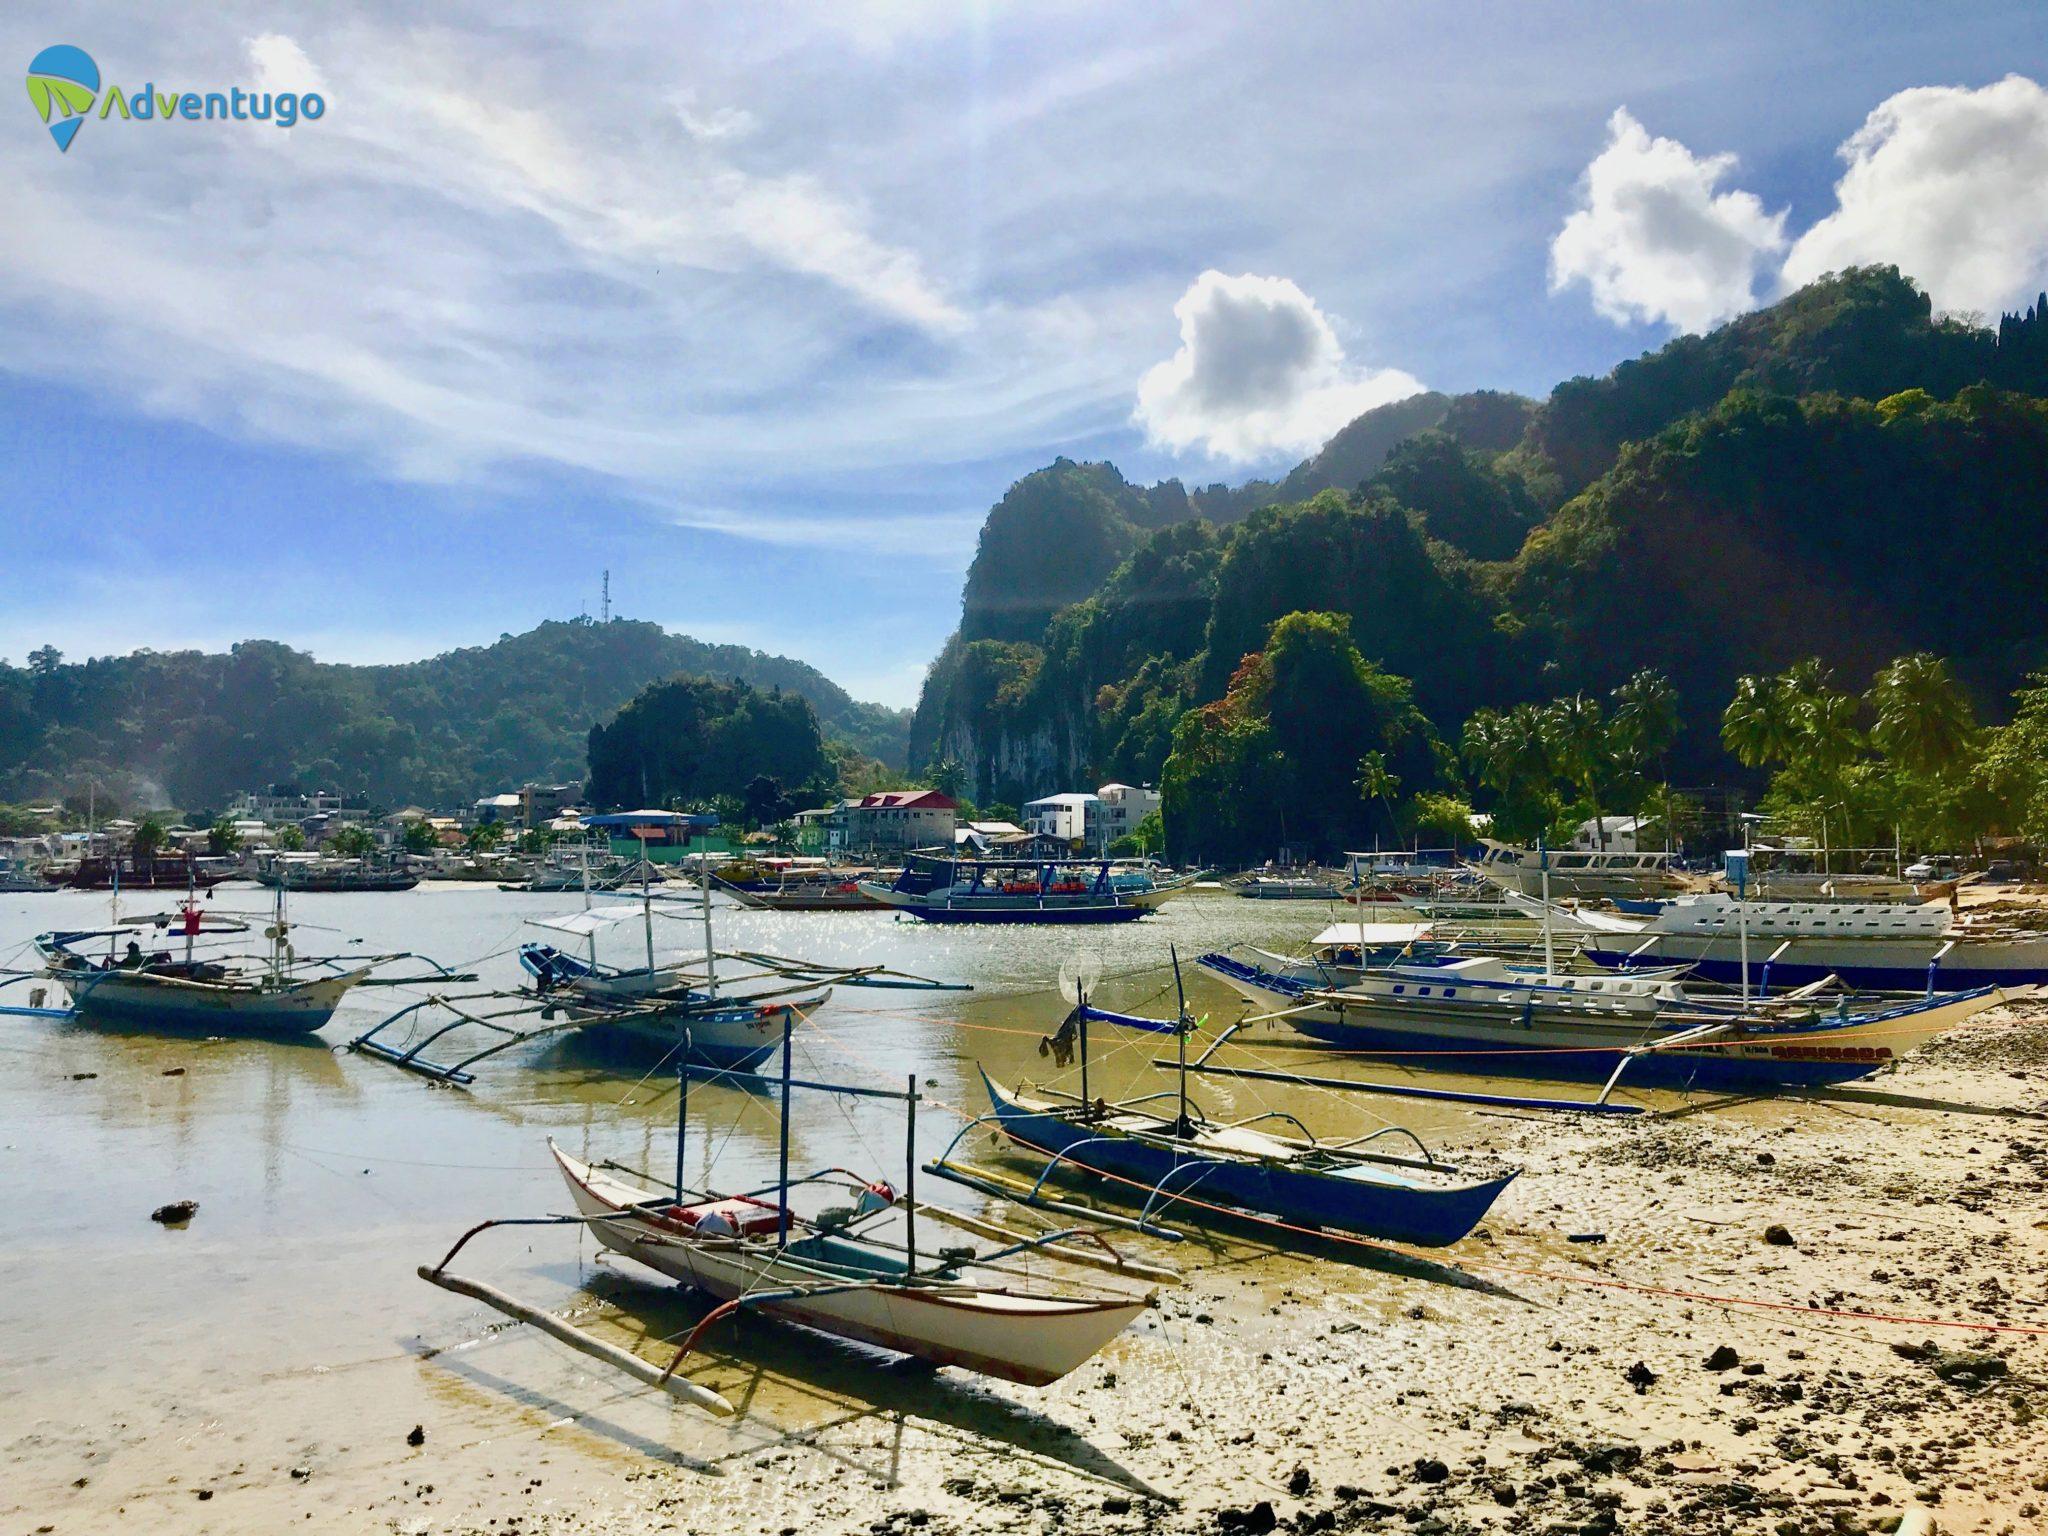 El Nido Boats in Villages, Philippines